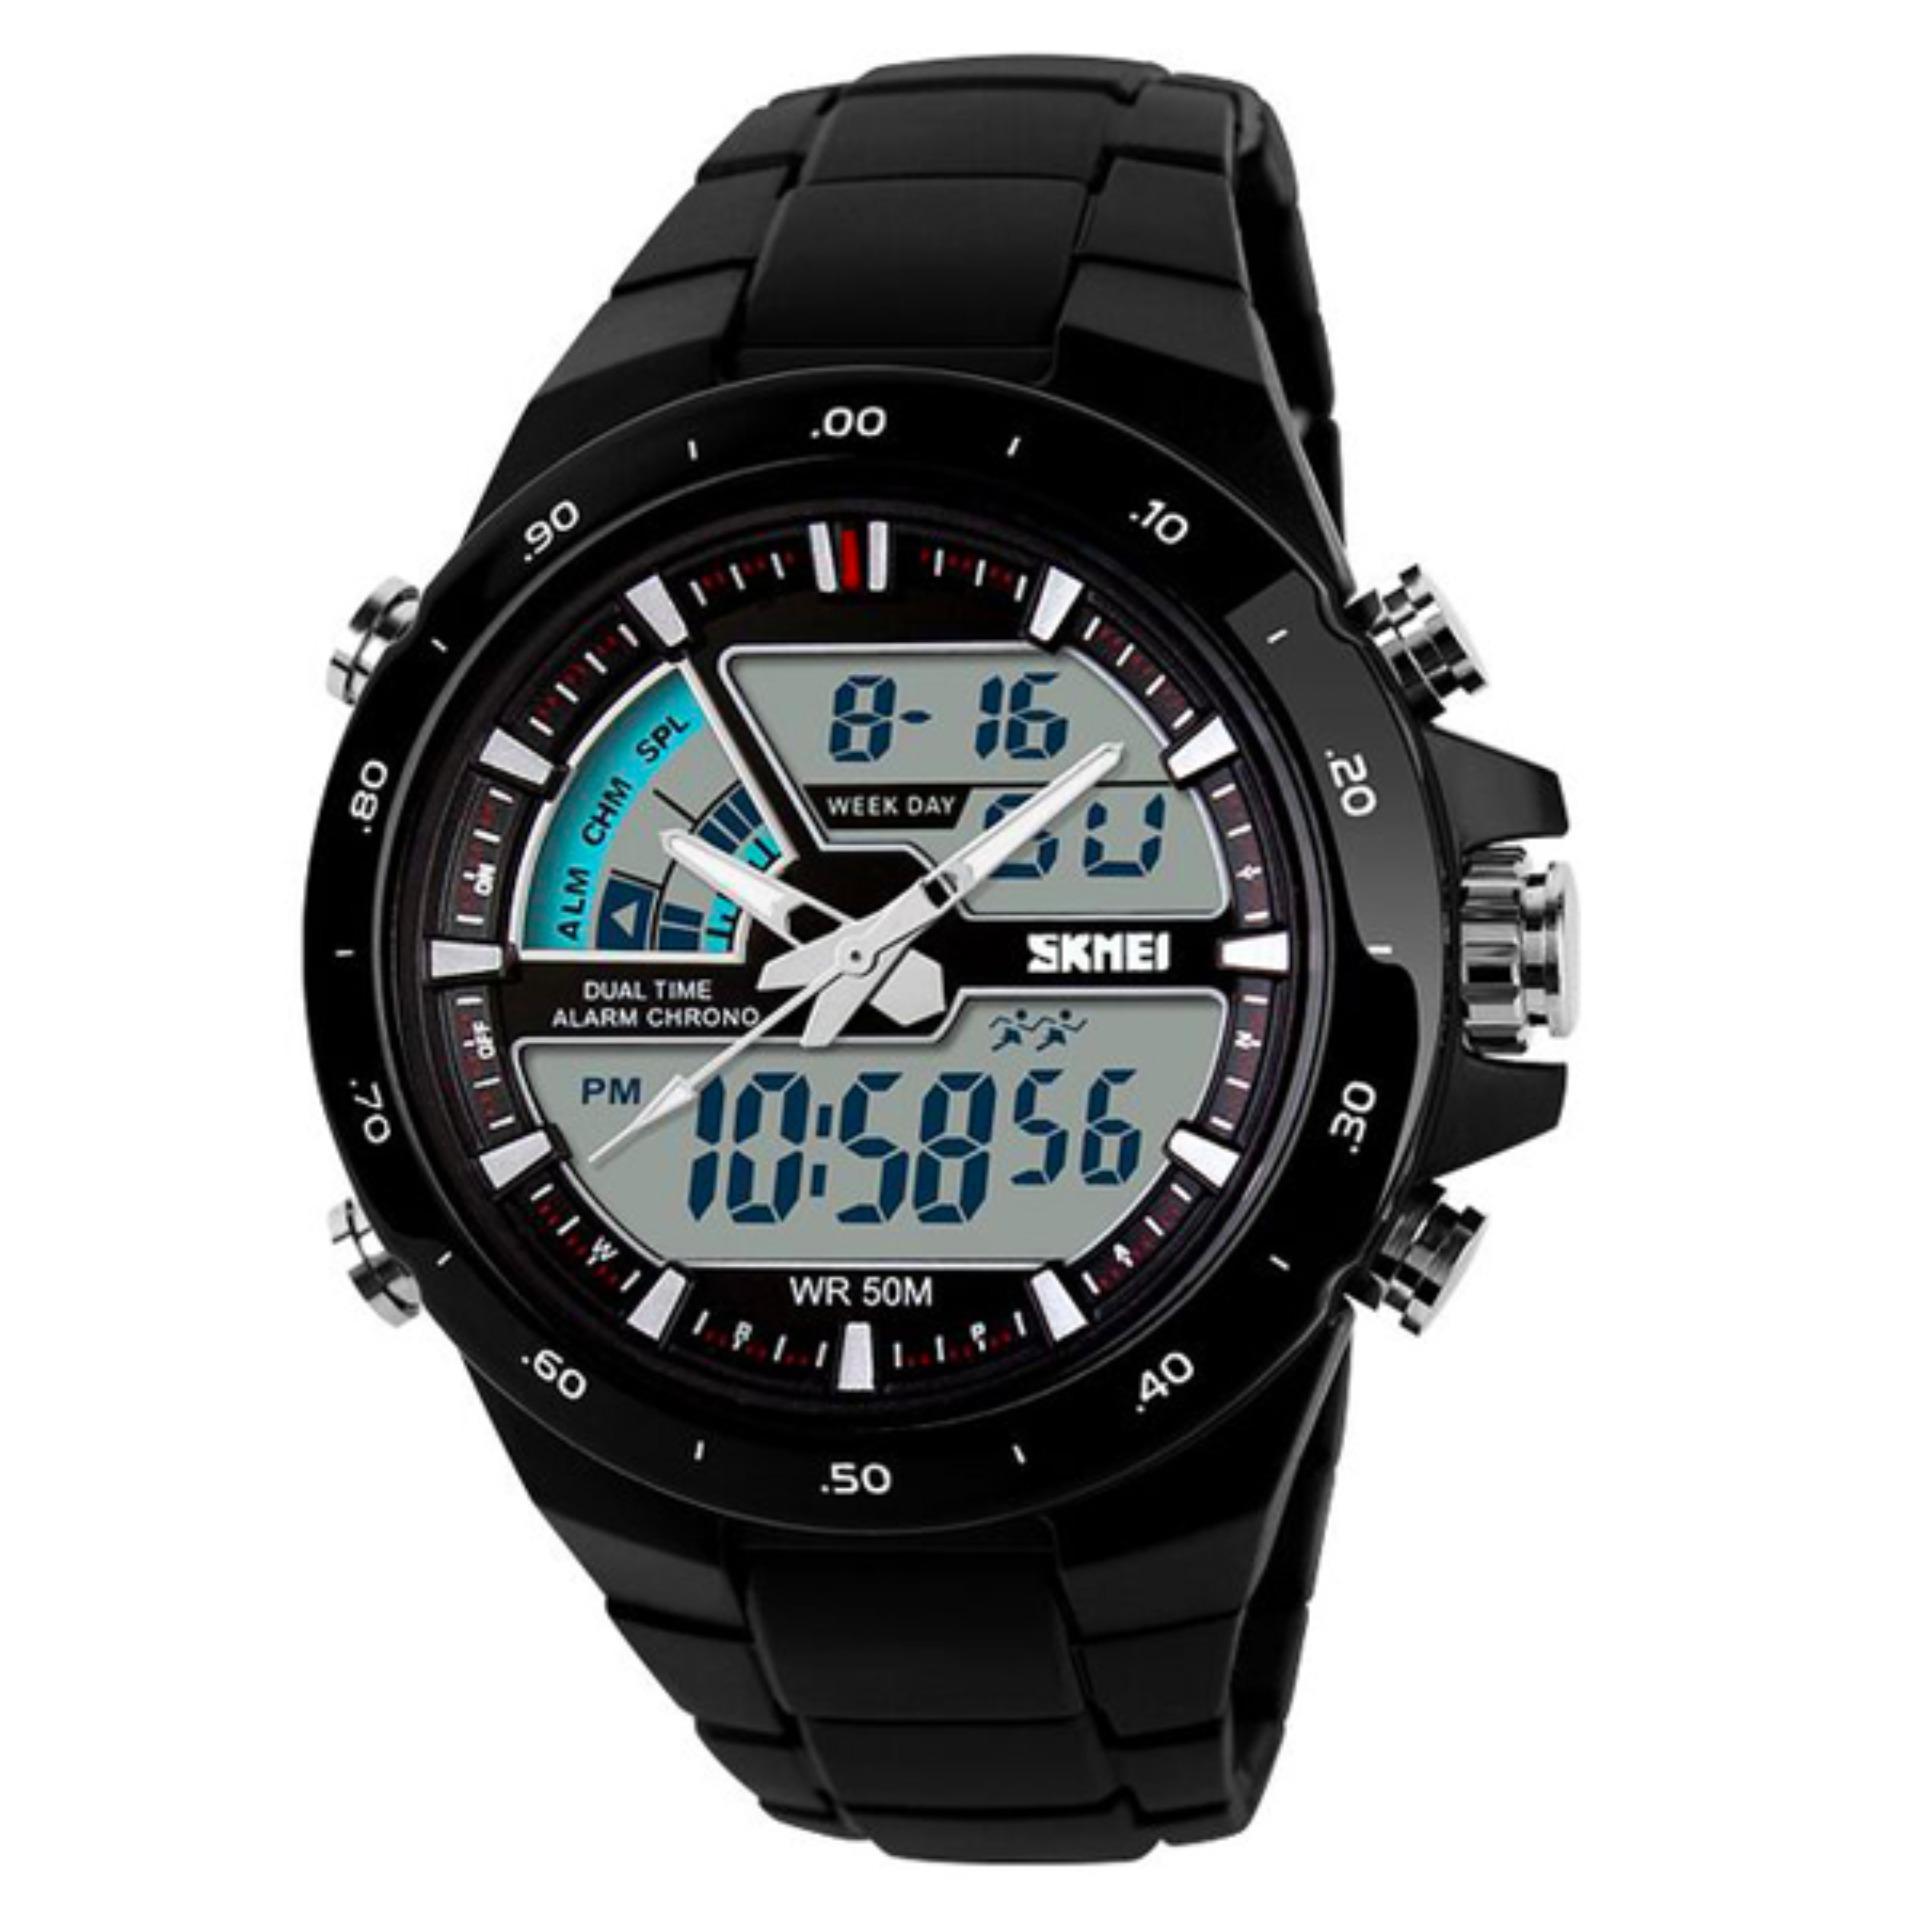 SKMEI Casio Men Sport LED Watch Water Resistant 50m AD1016 Jam Tangan Sporty Pria